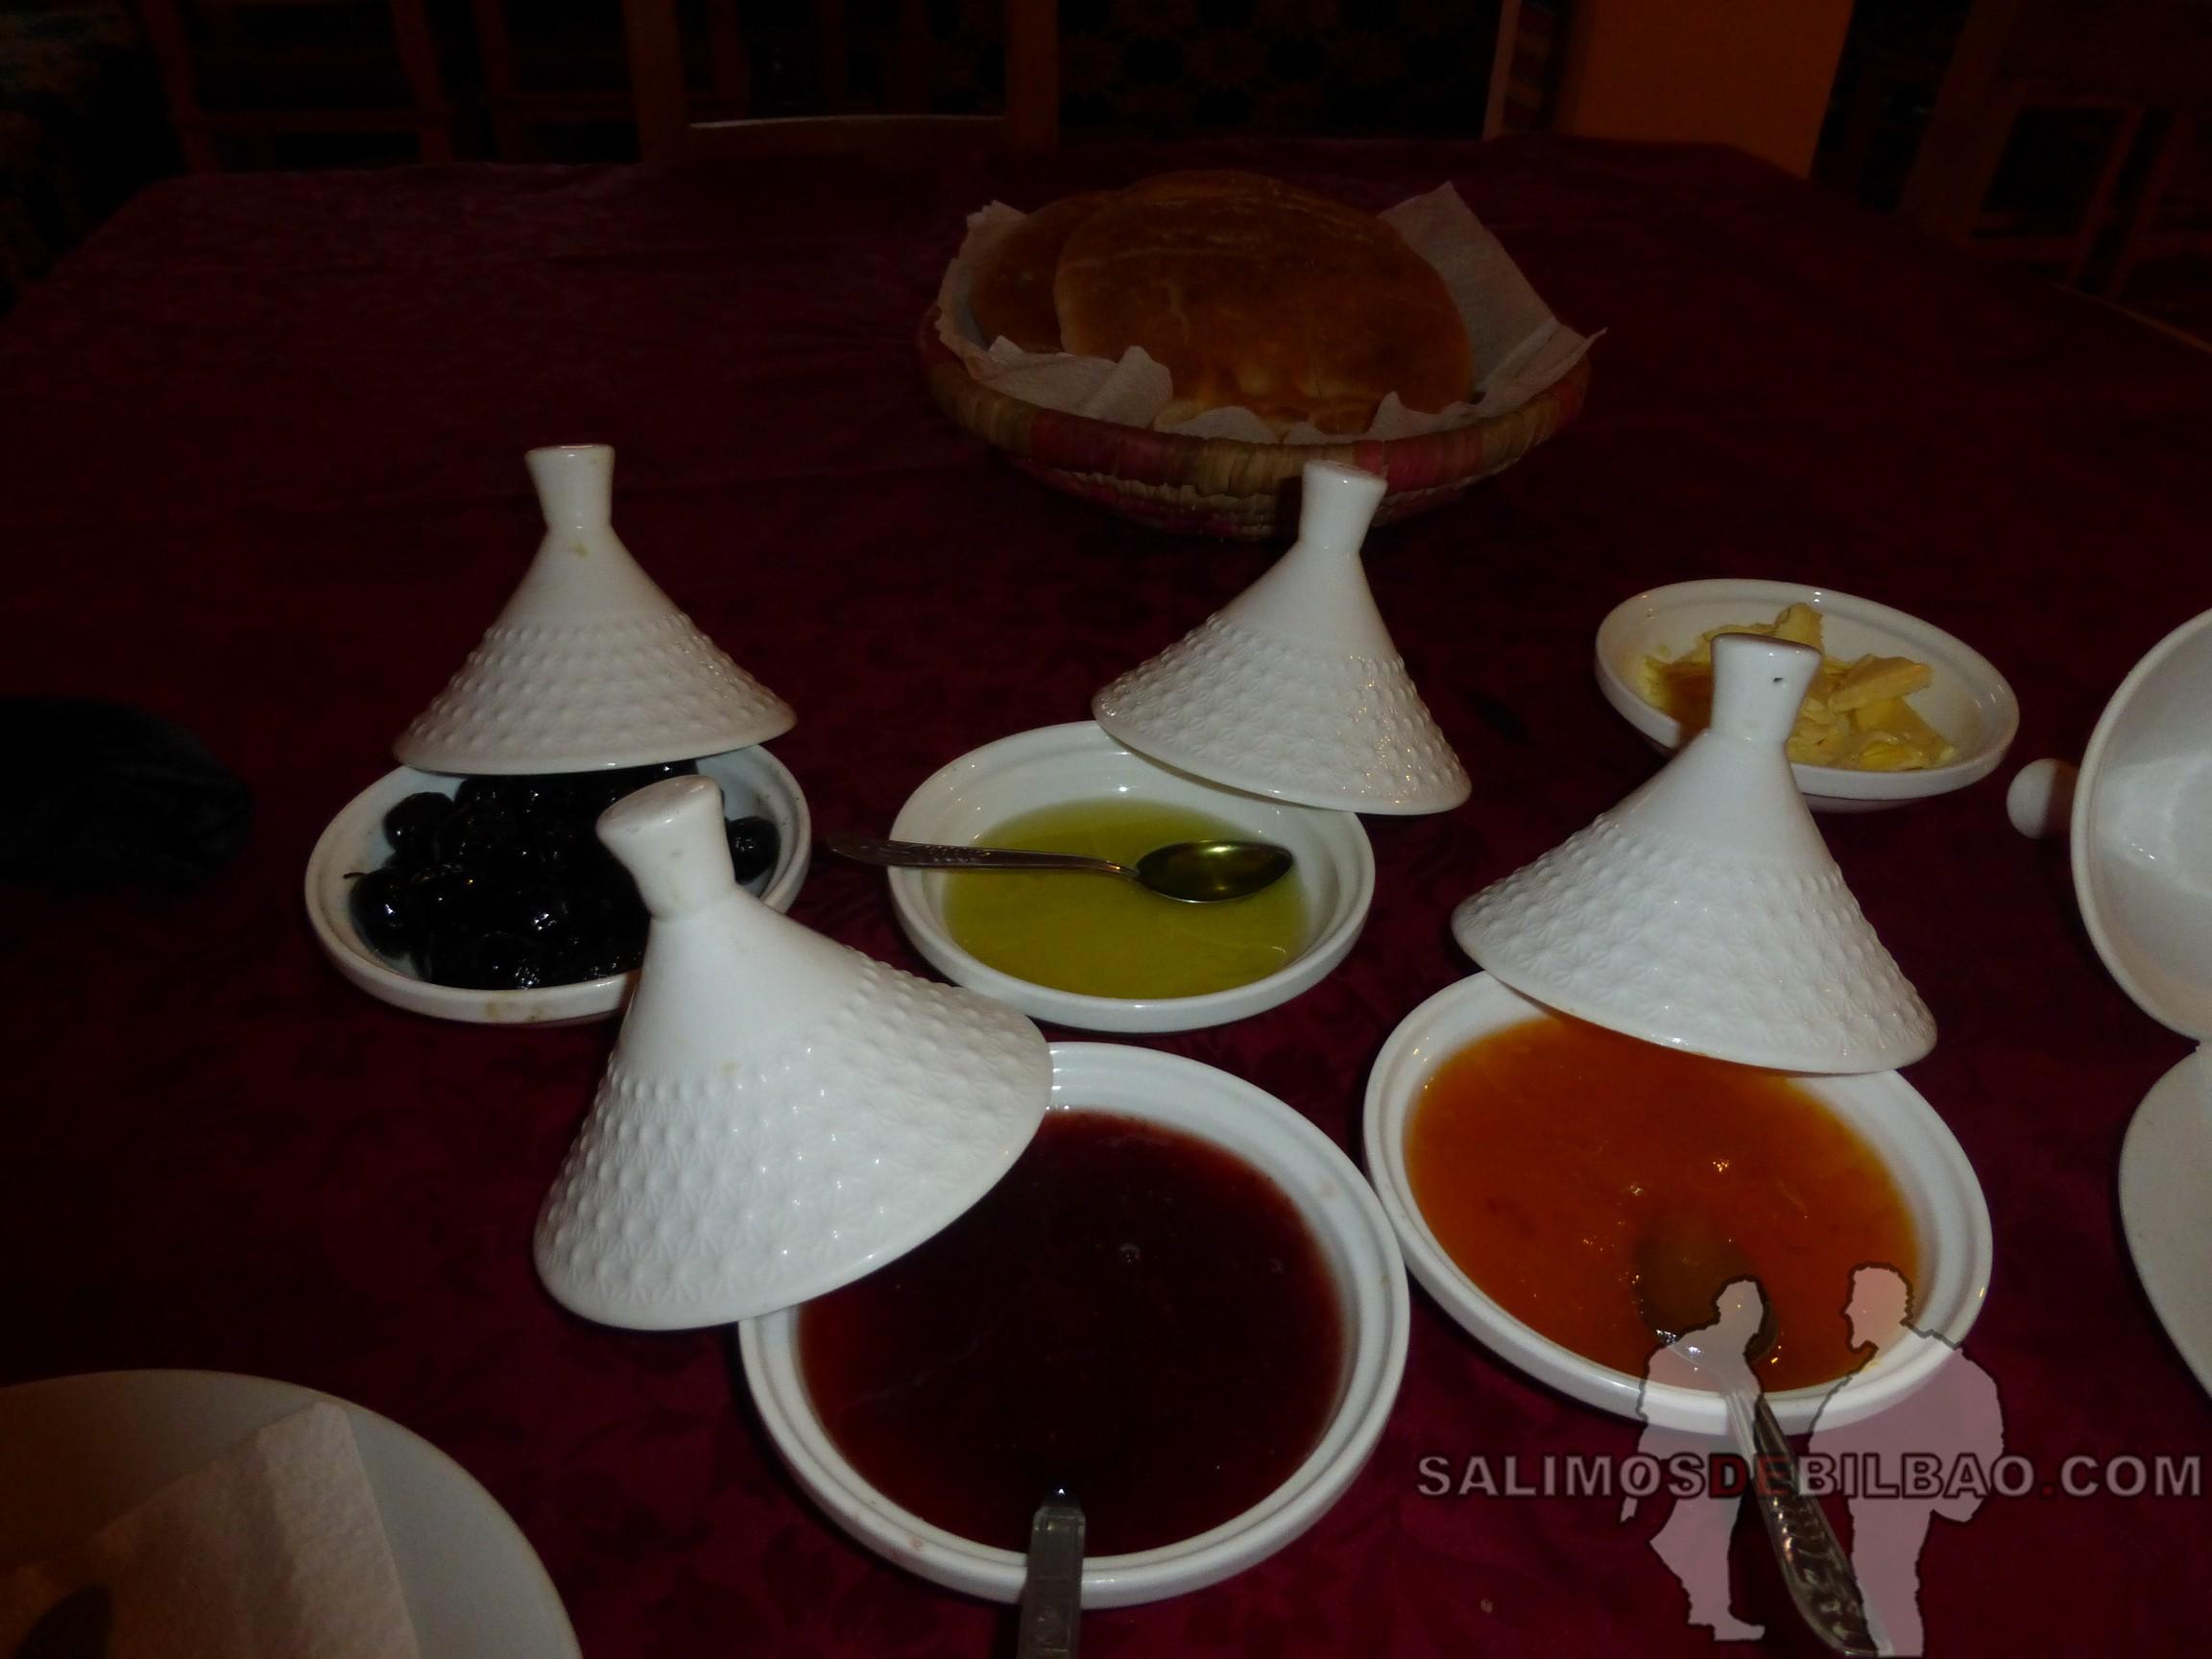 467. Desayuno en Hotel La Baraka, Kasbah Ait Ben Haddou